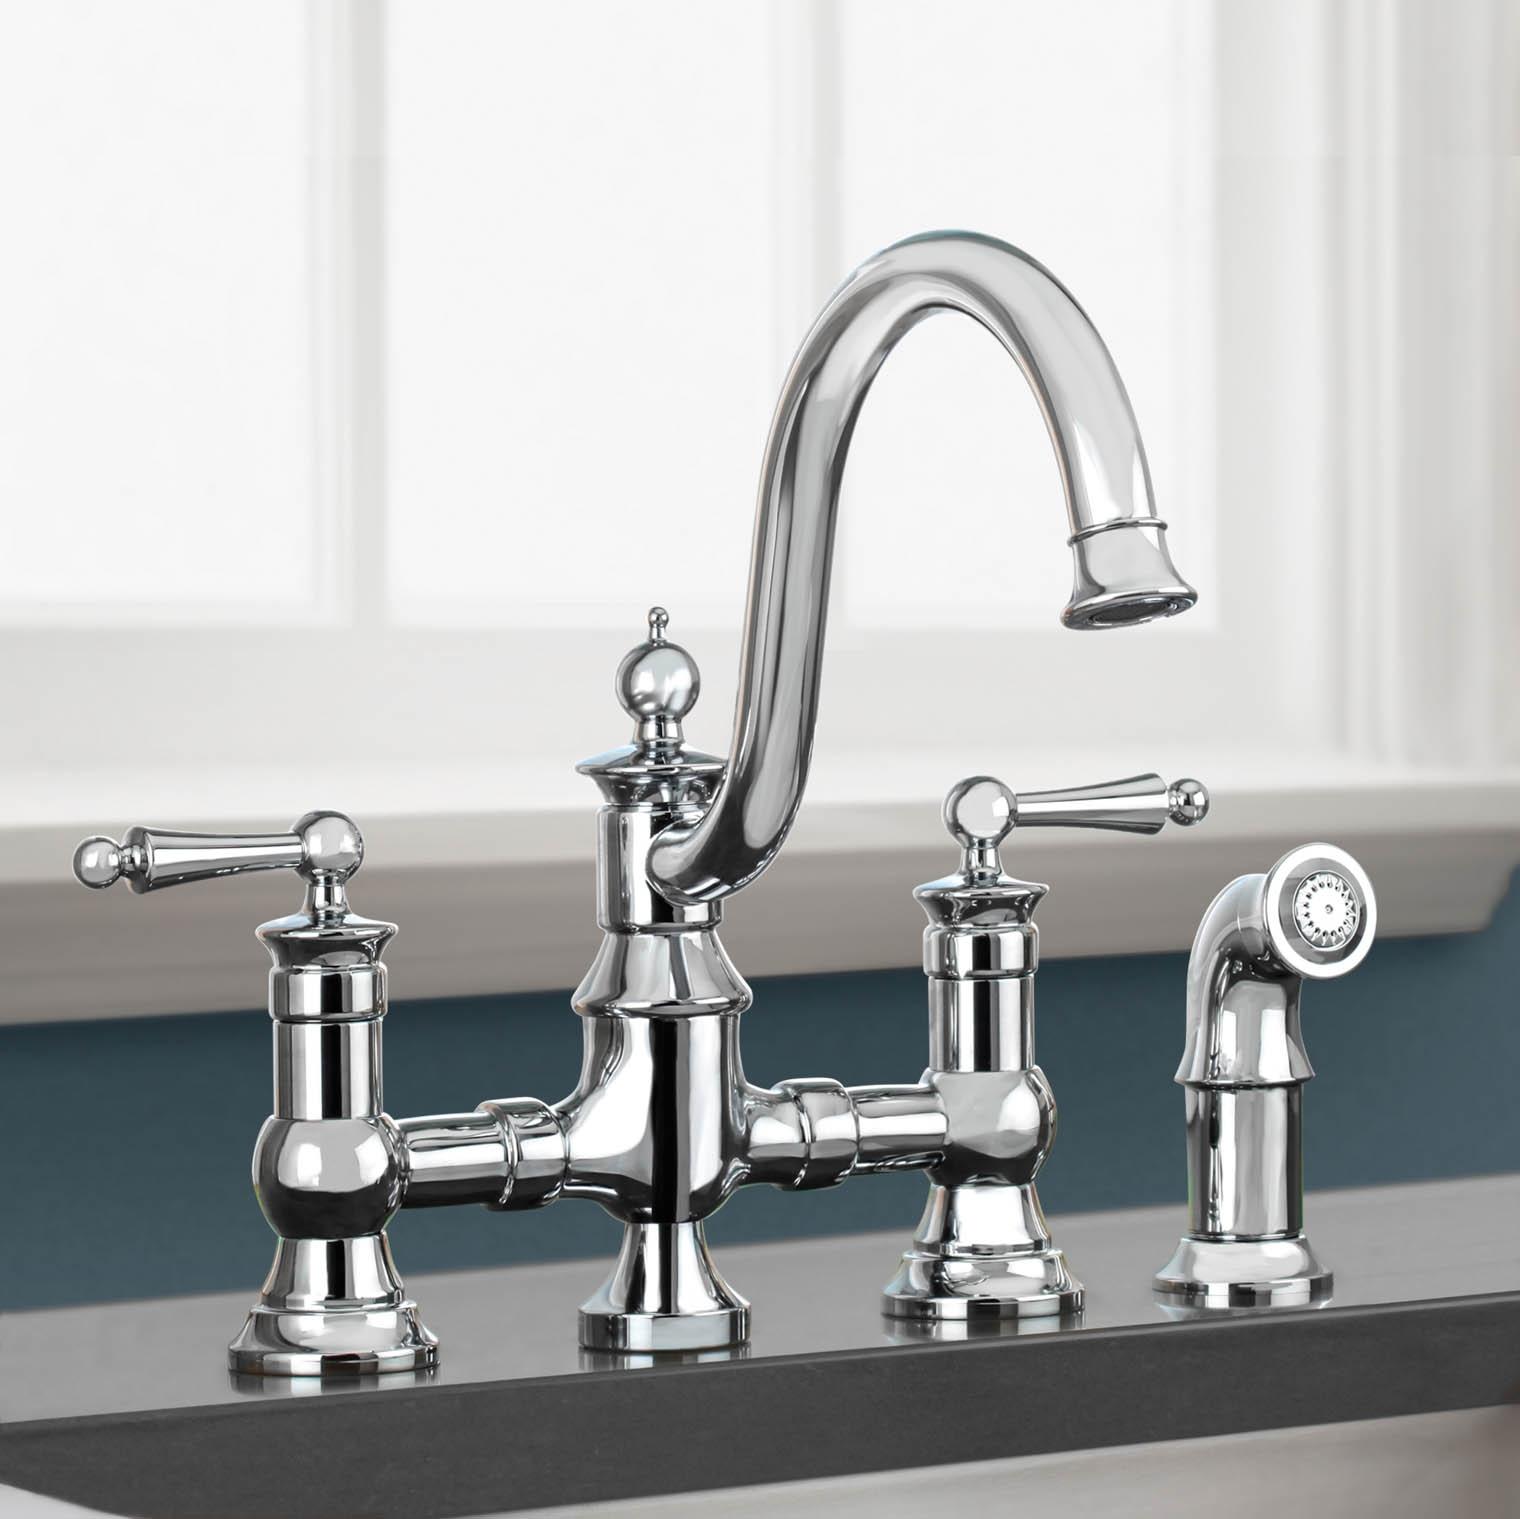 Ideas, moen faucet model 87881 moen faucet model 87881 moen kitchen faucet top 5 best moen kitchen faucets reviews new 1520 x 1519  .